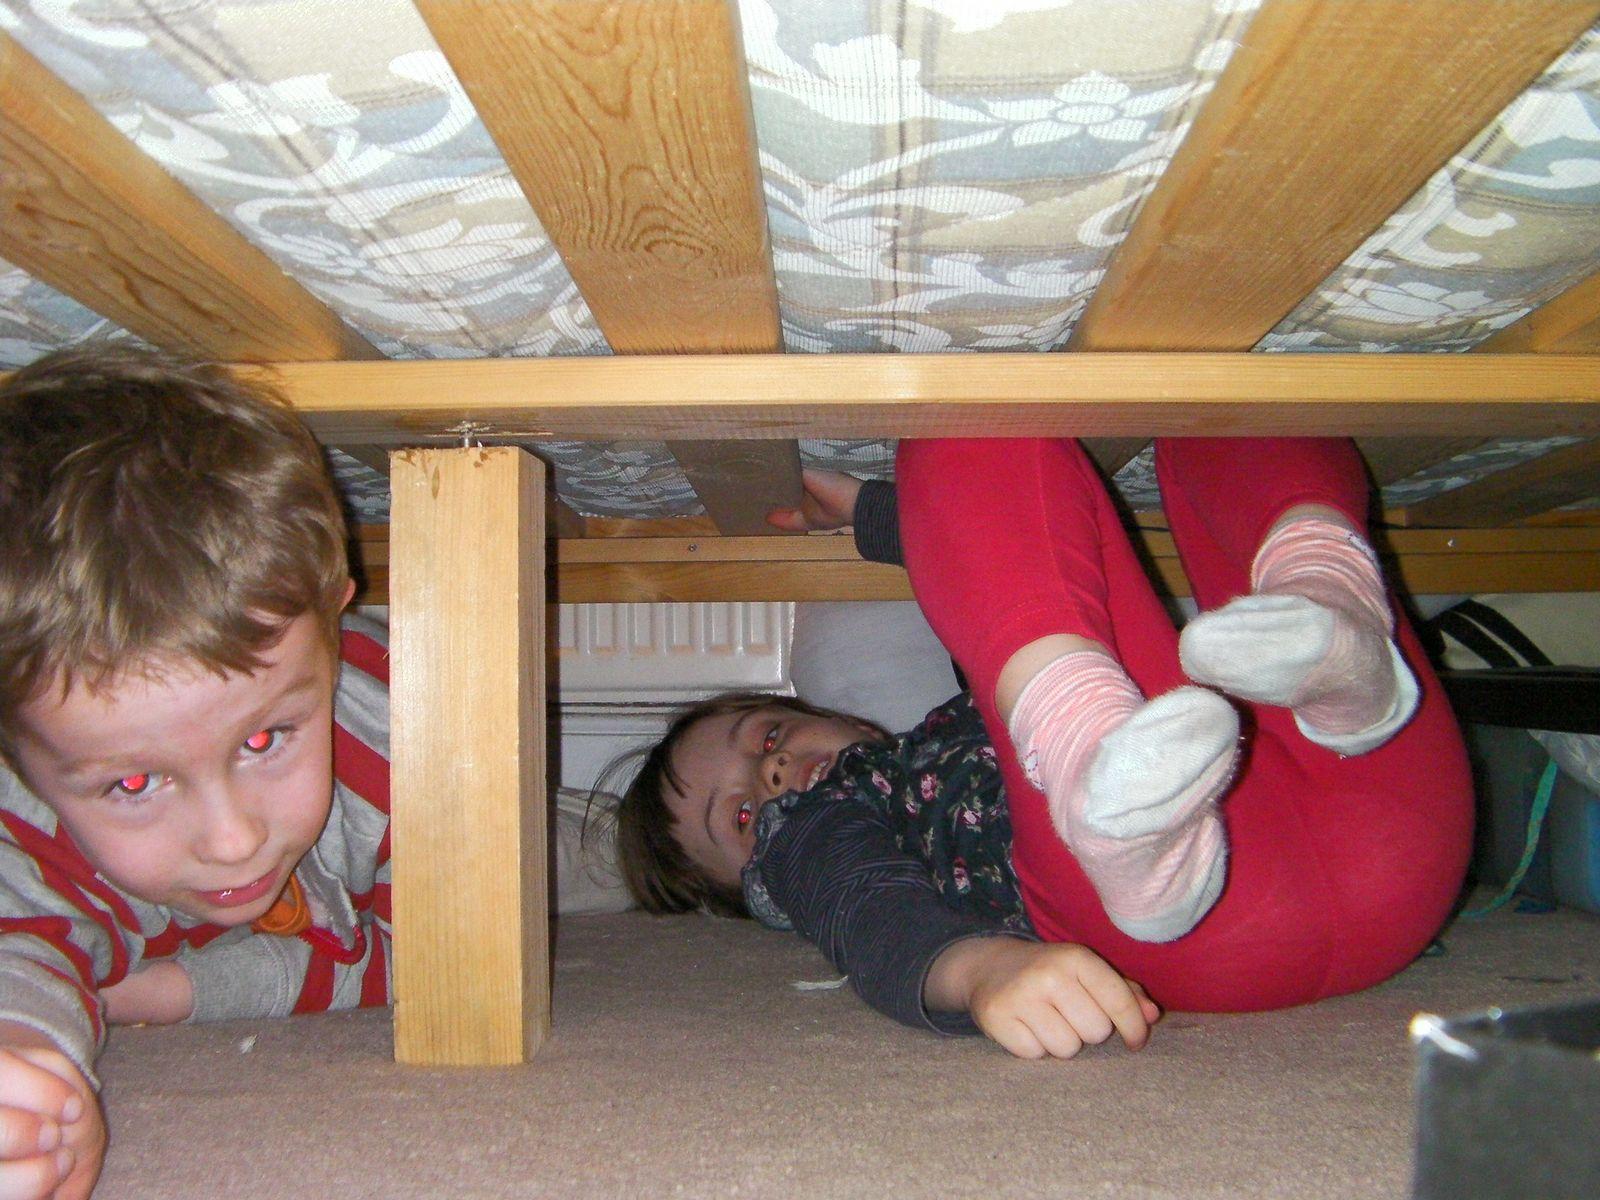 kids hiding under a bed wooden support strut